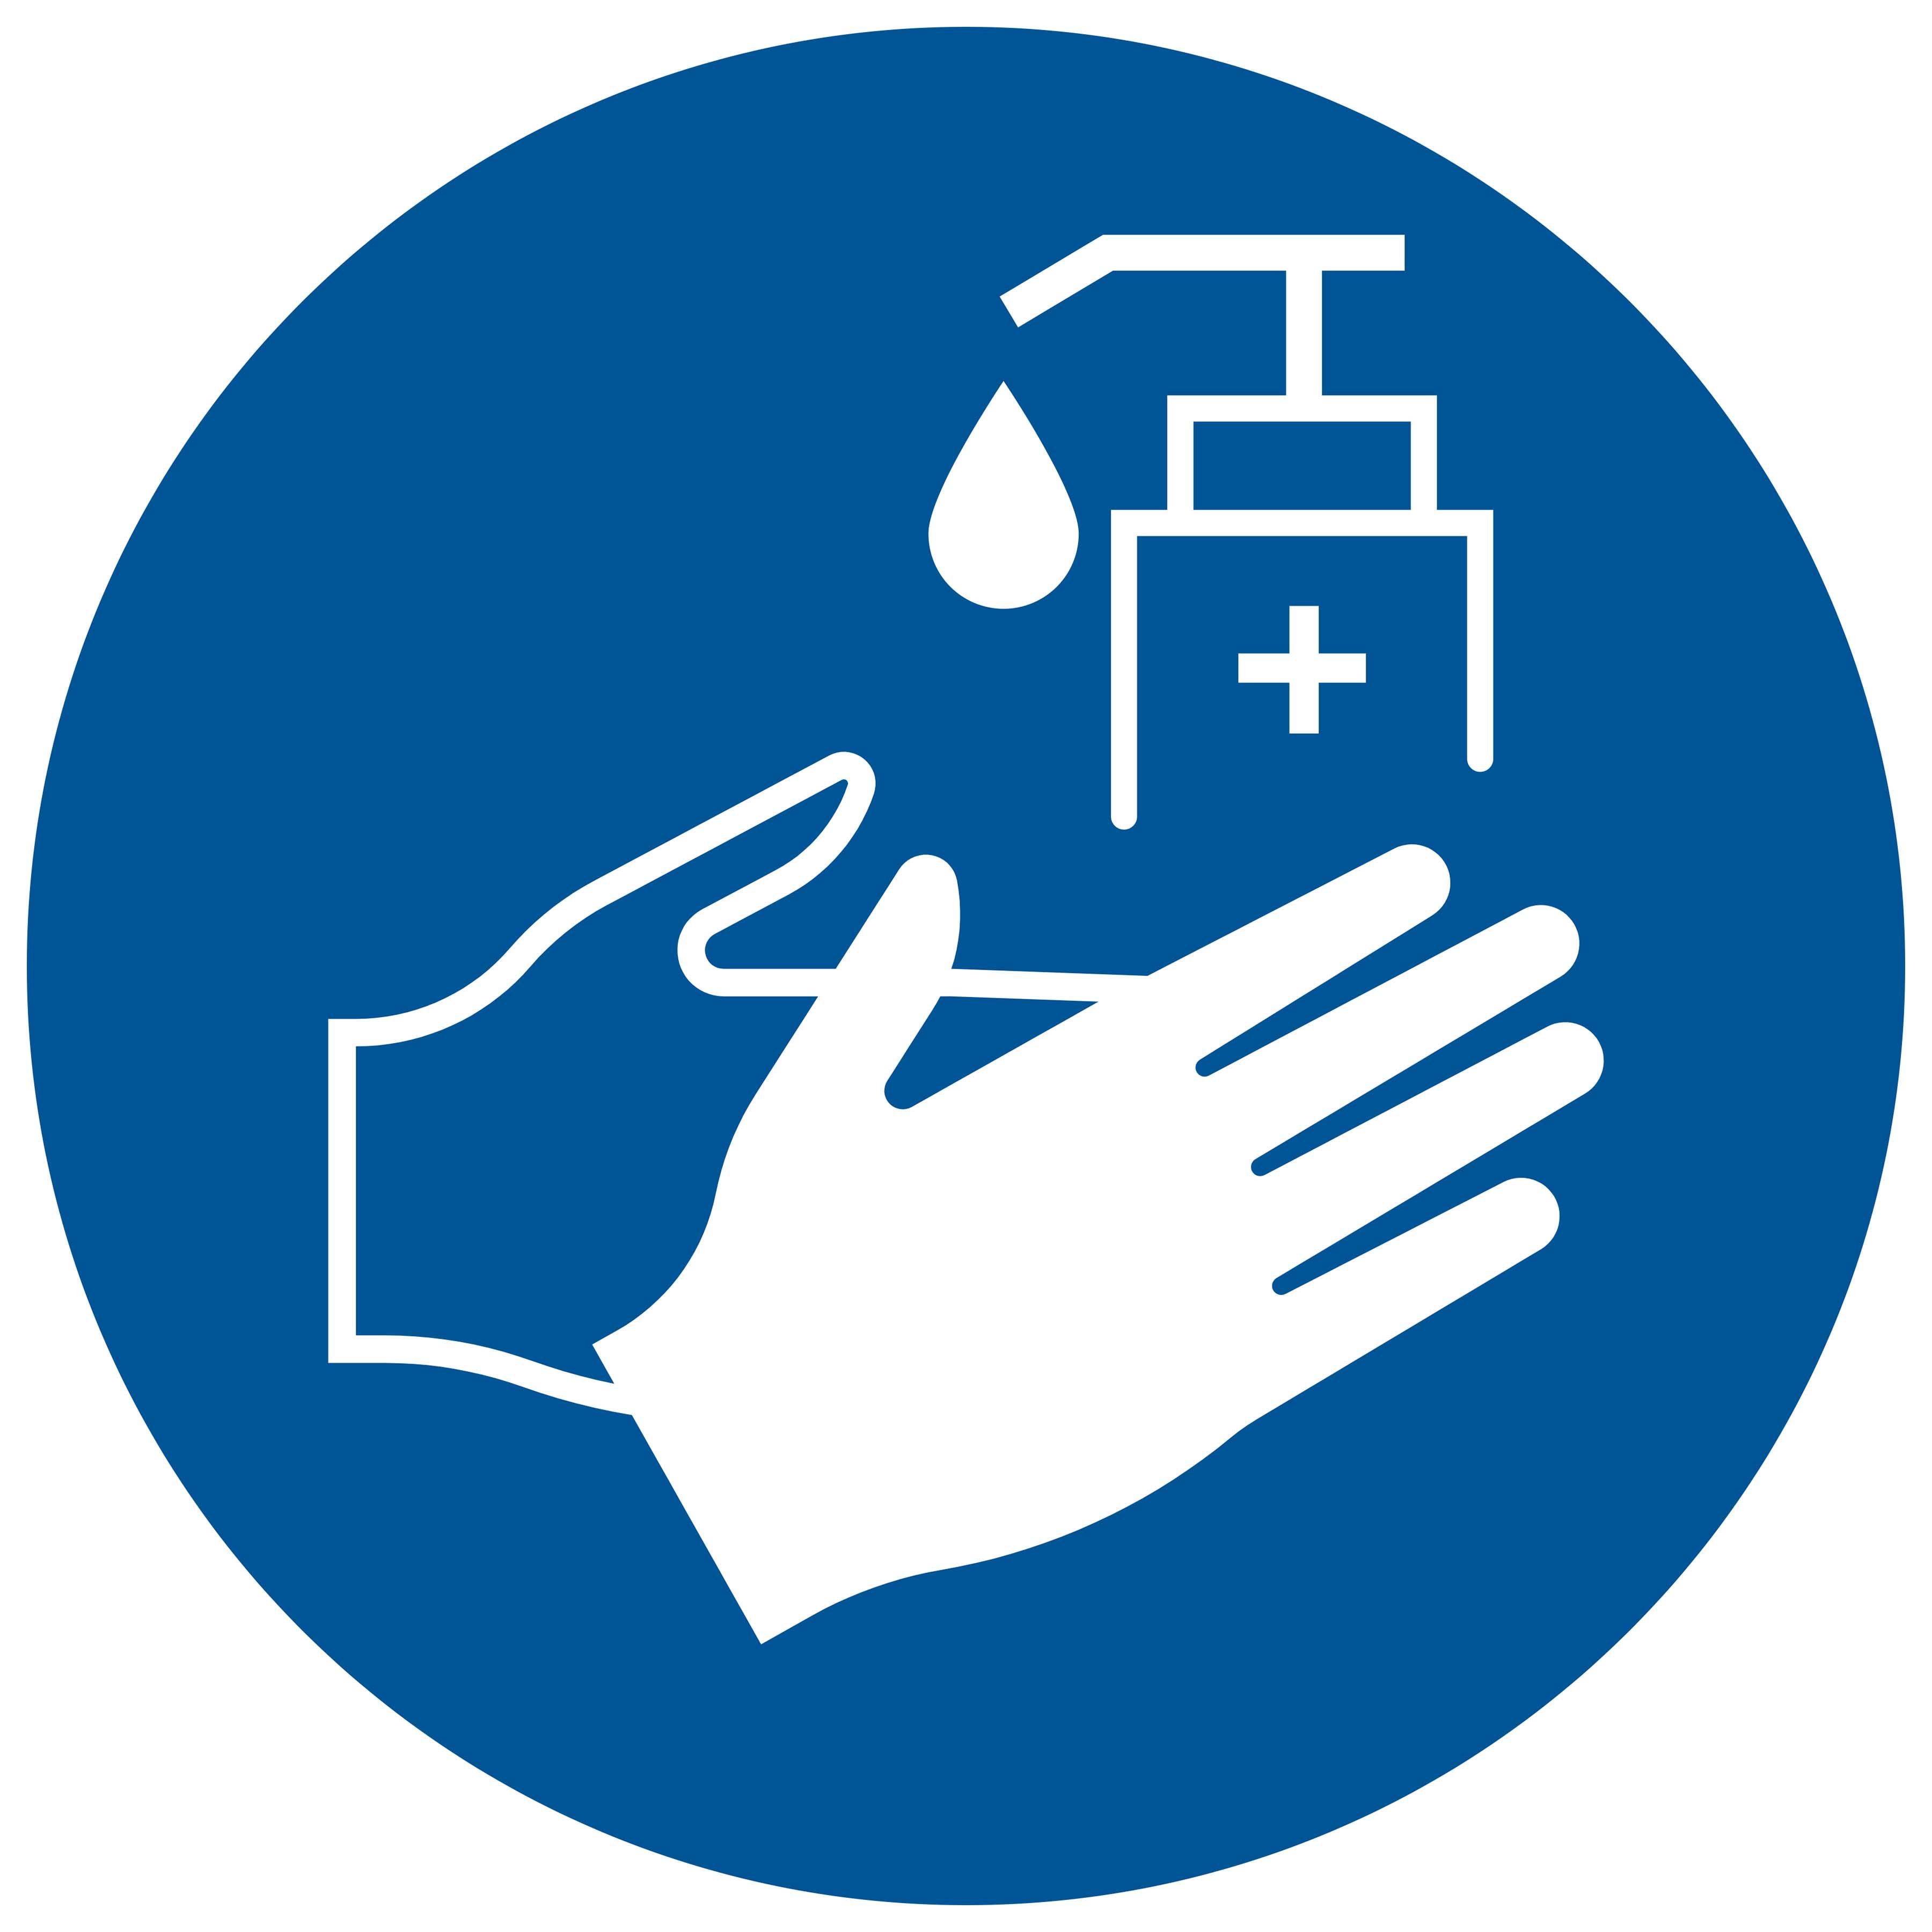 Bord Handen desinfecteren verplicht - Disinfect hands required -Désinfection des mains requise - Hände desinfizieren erforderlich- social distance COVID19 COVID-19 corona virus